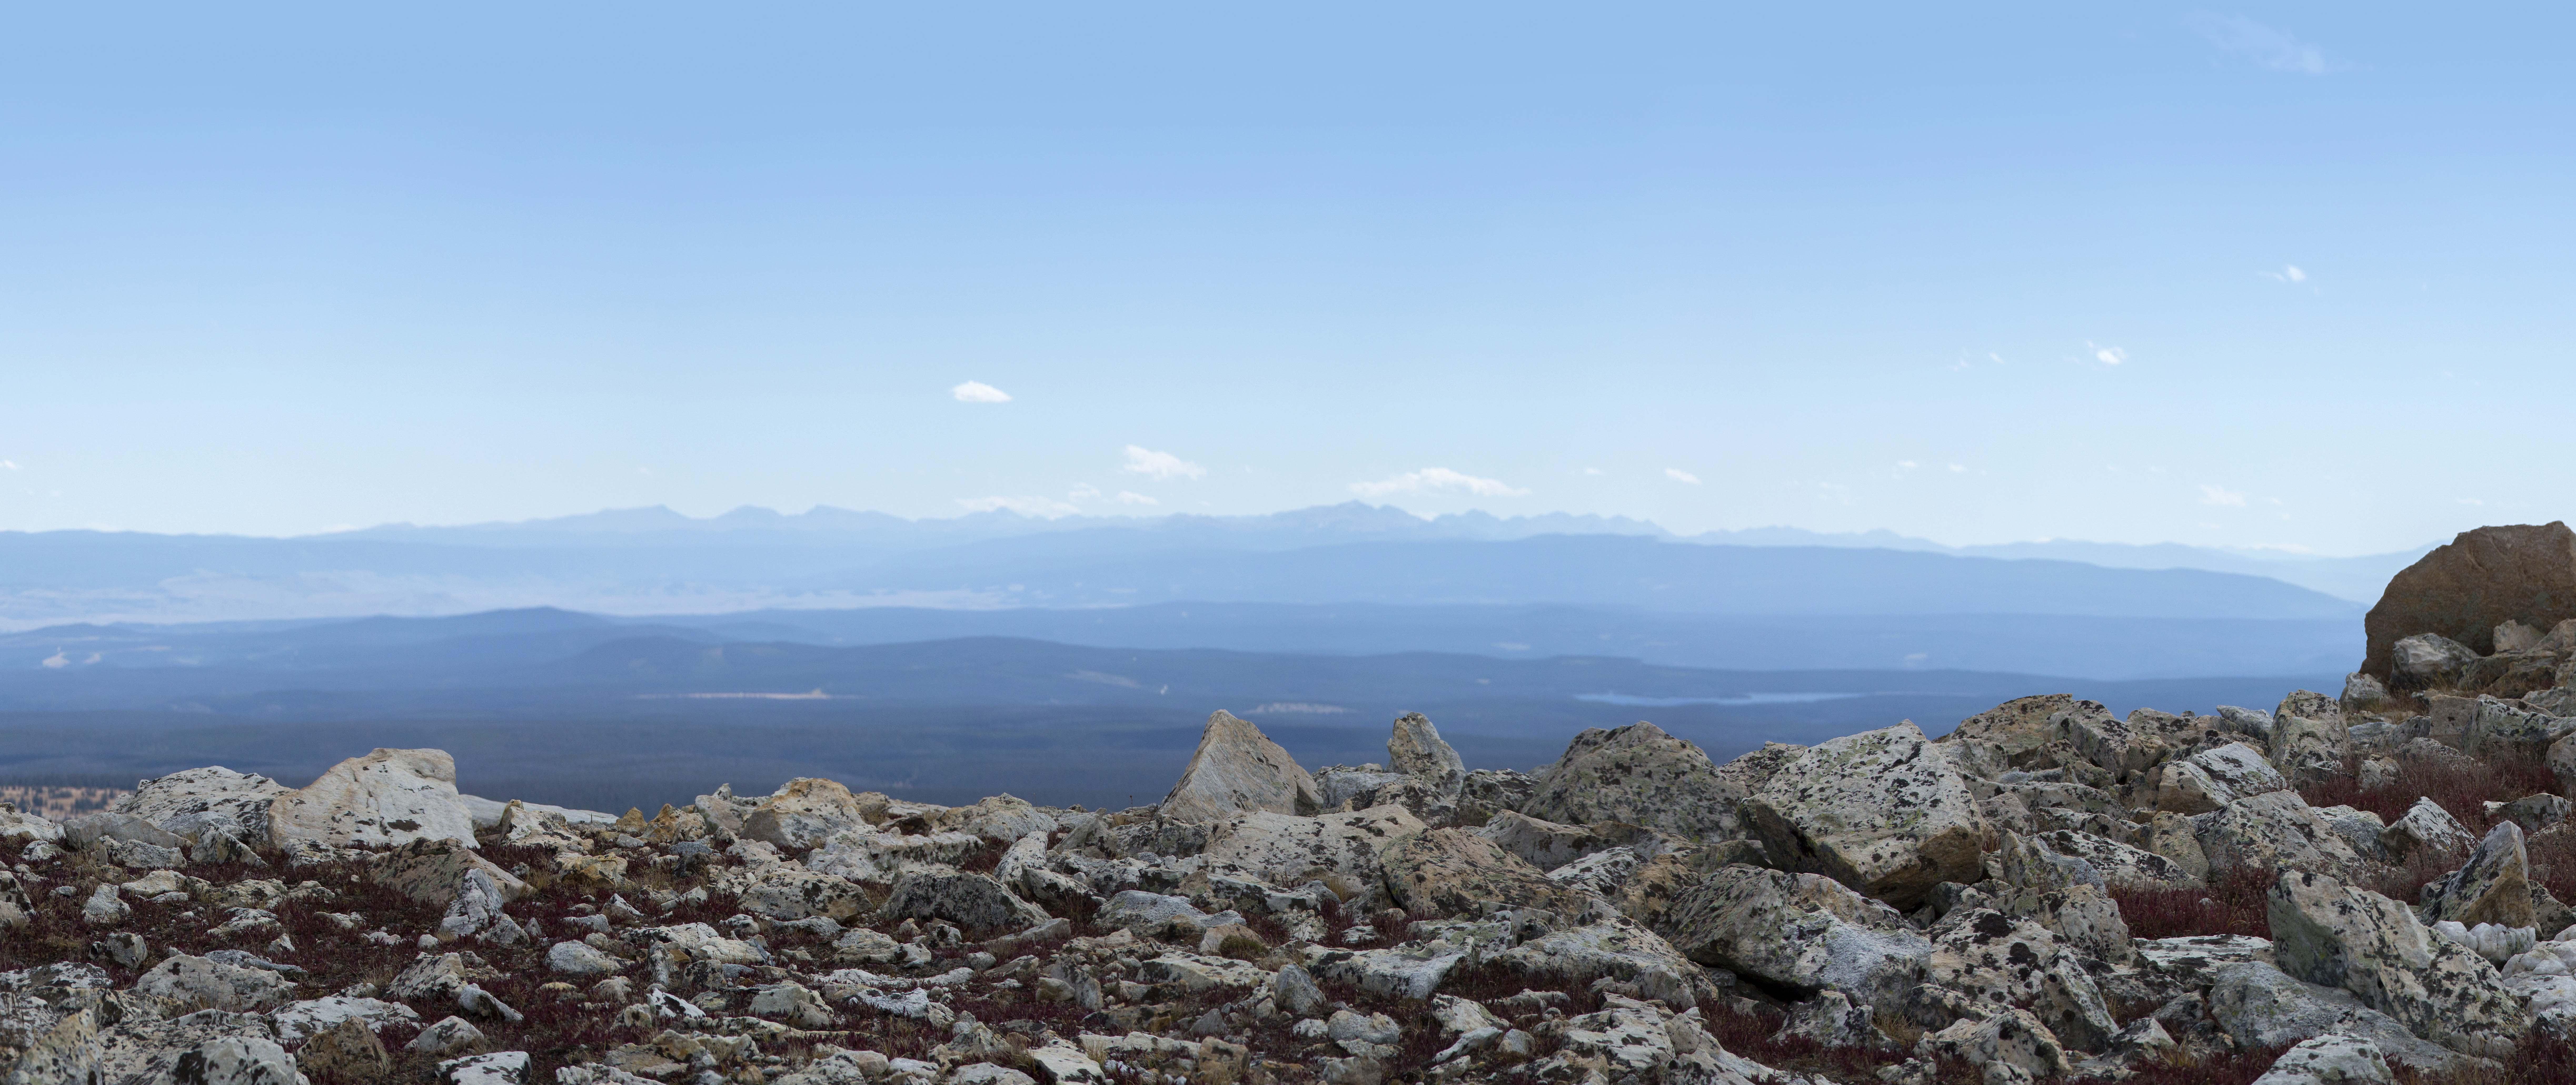 Hiking Medicine Bow Peak trail near Laramie, Wyoming